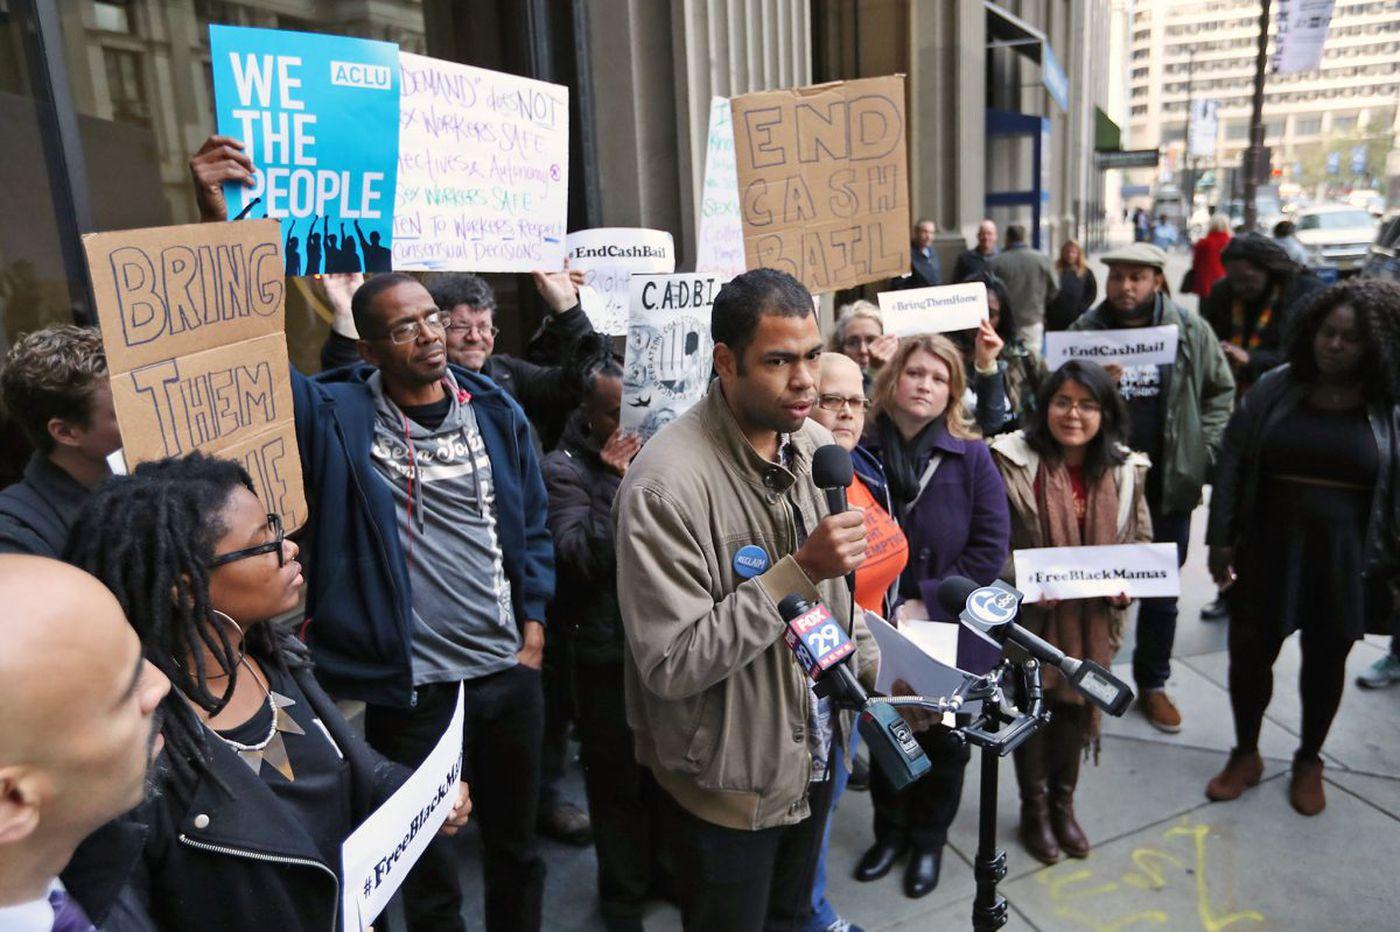 Coalition calls for 'transformative change' in Krasner's 1st 100 days